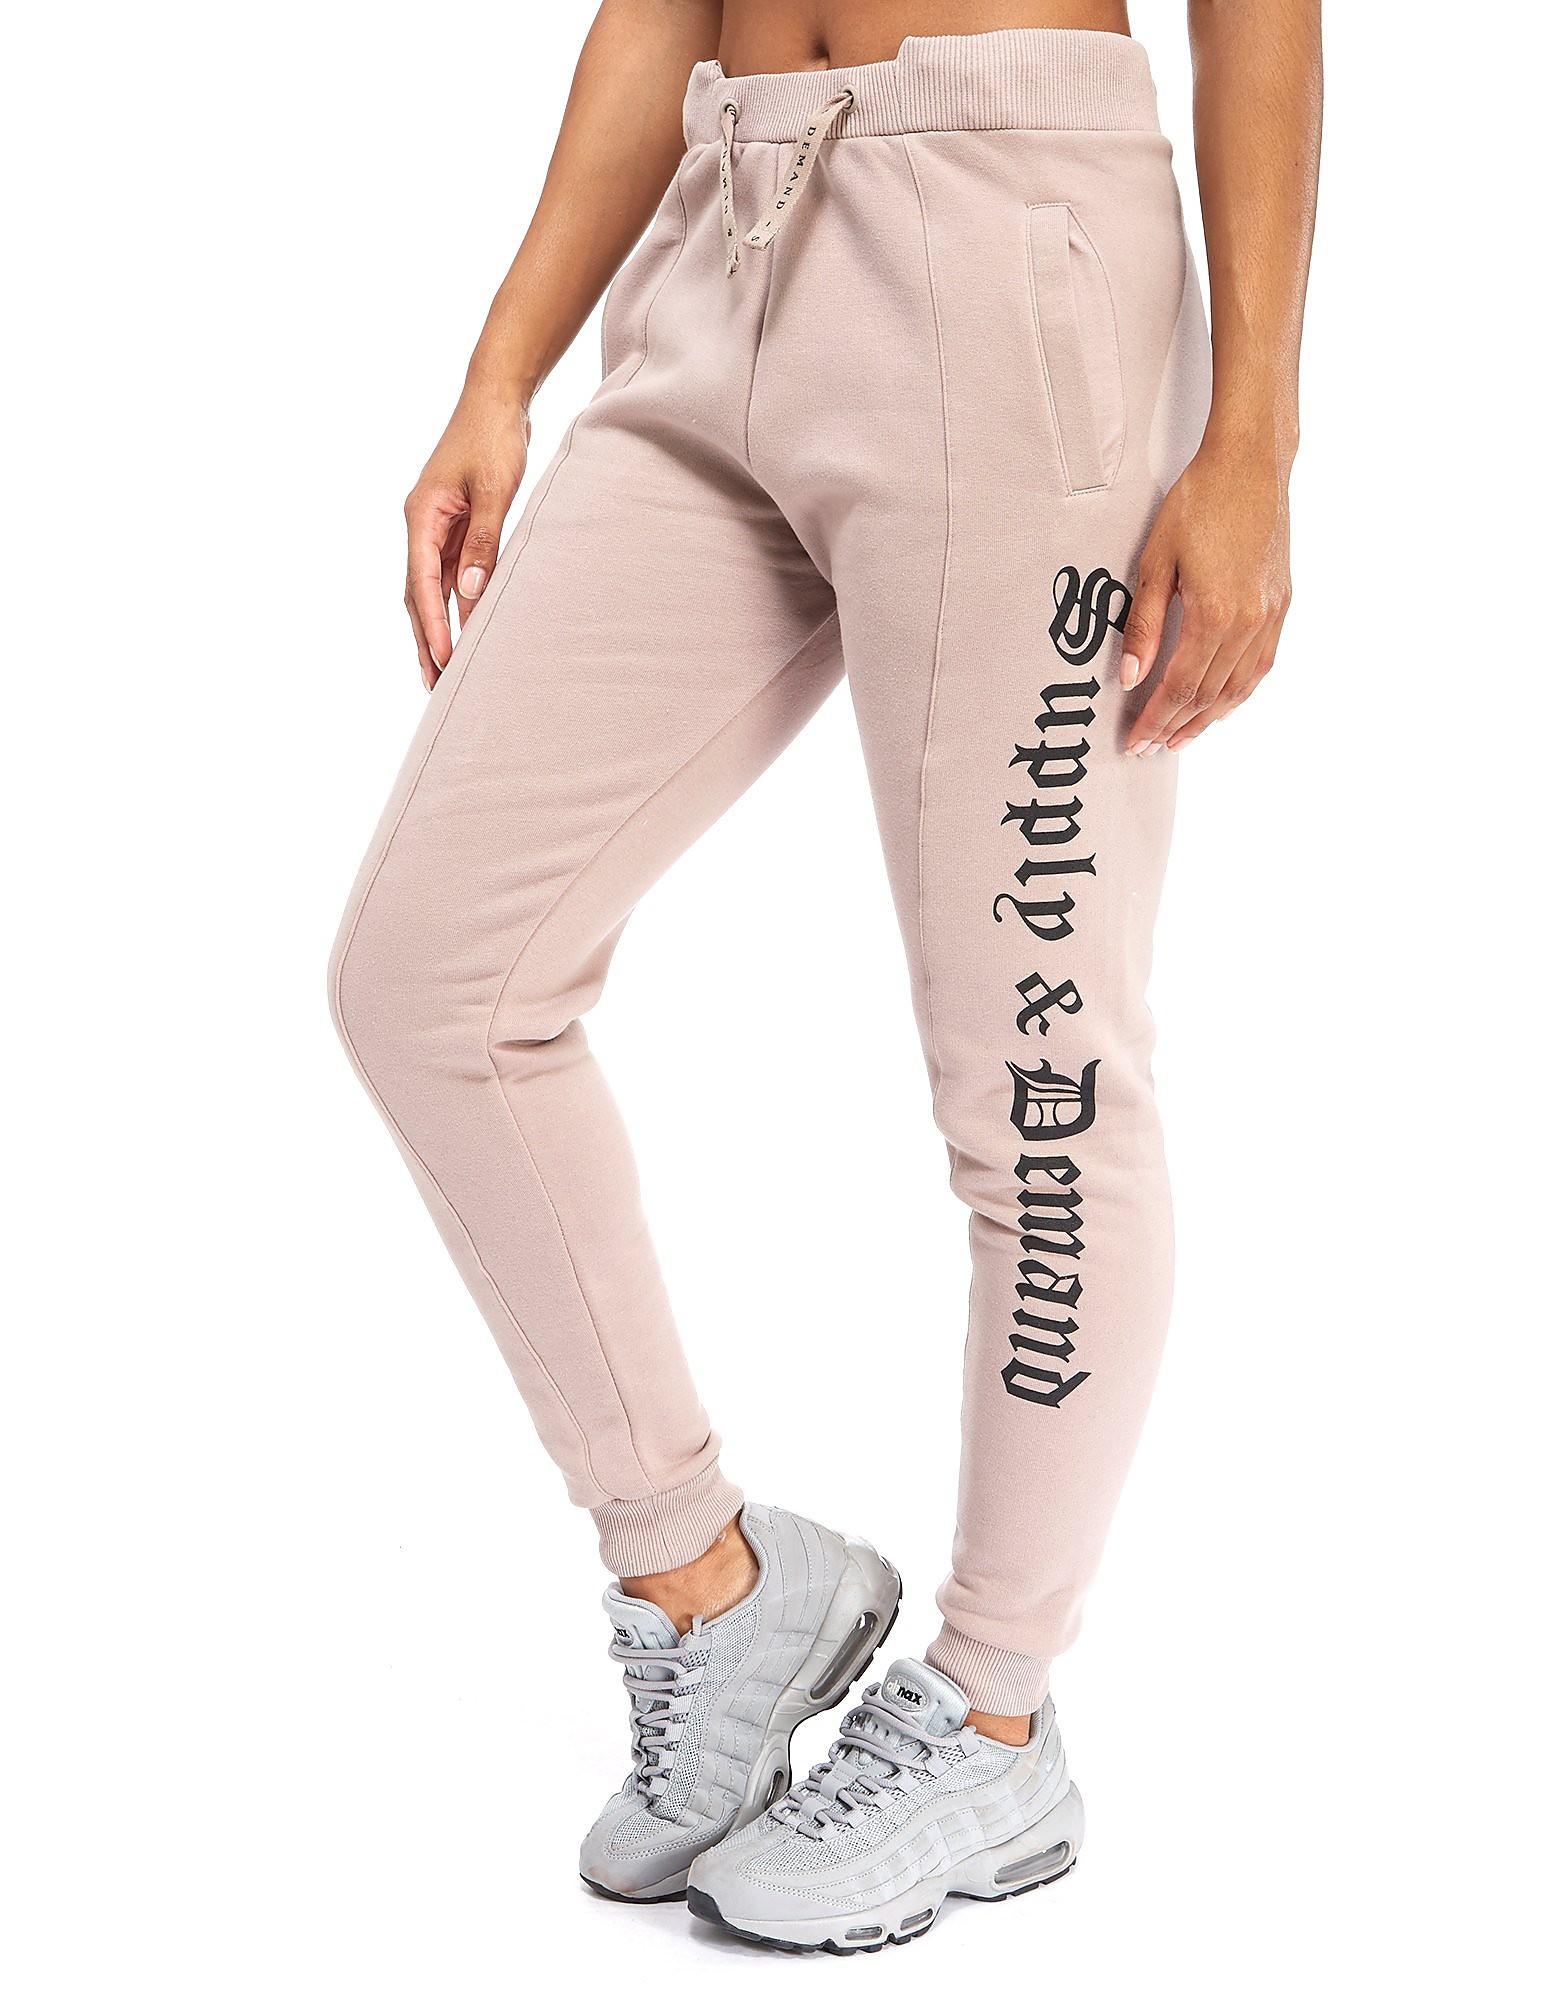 Supply & Demand Asymetric Pantaloni Donna